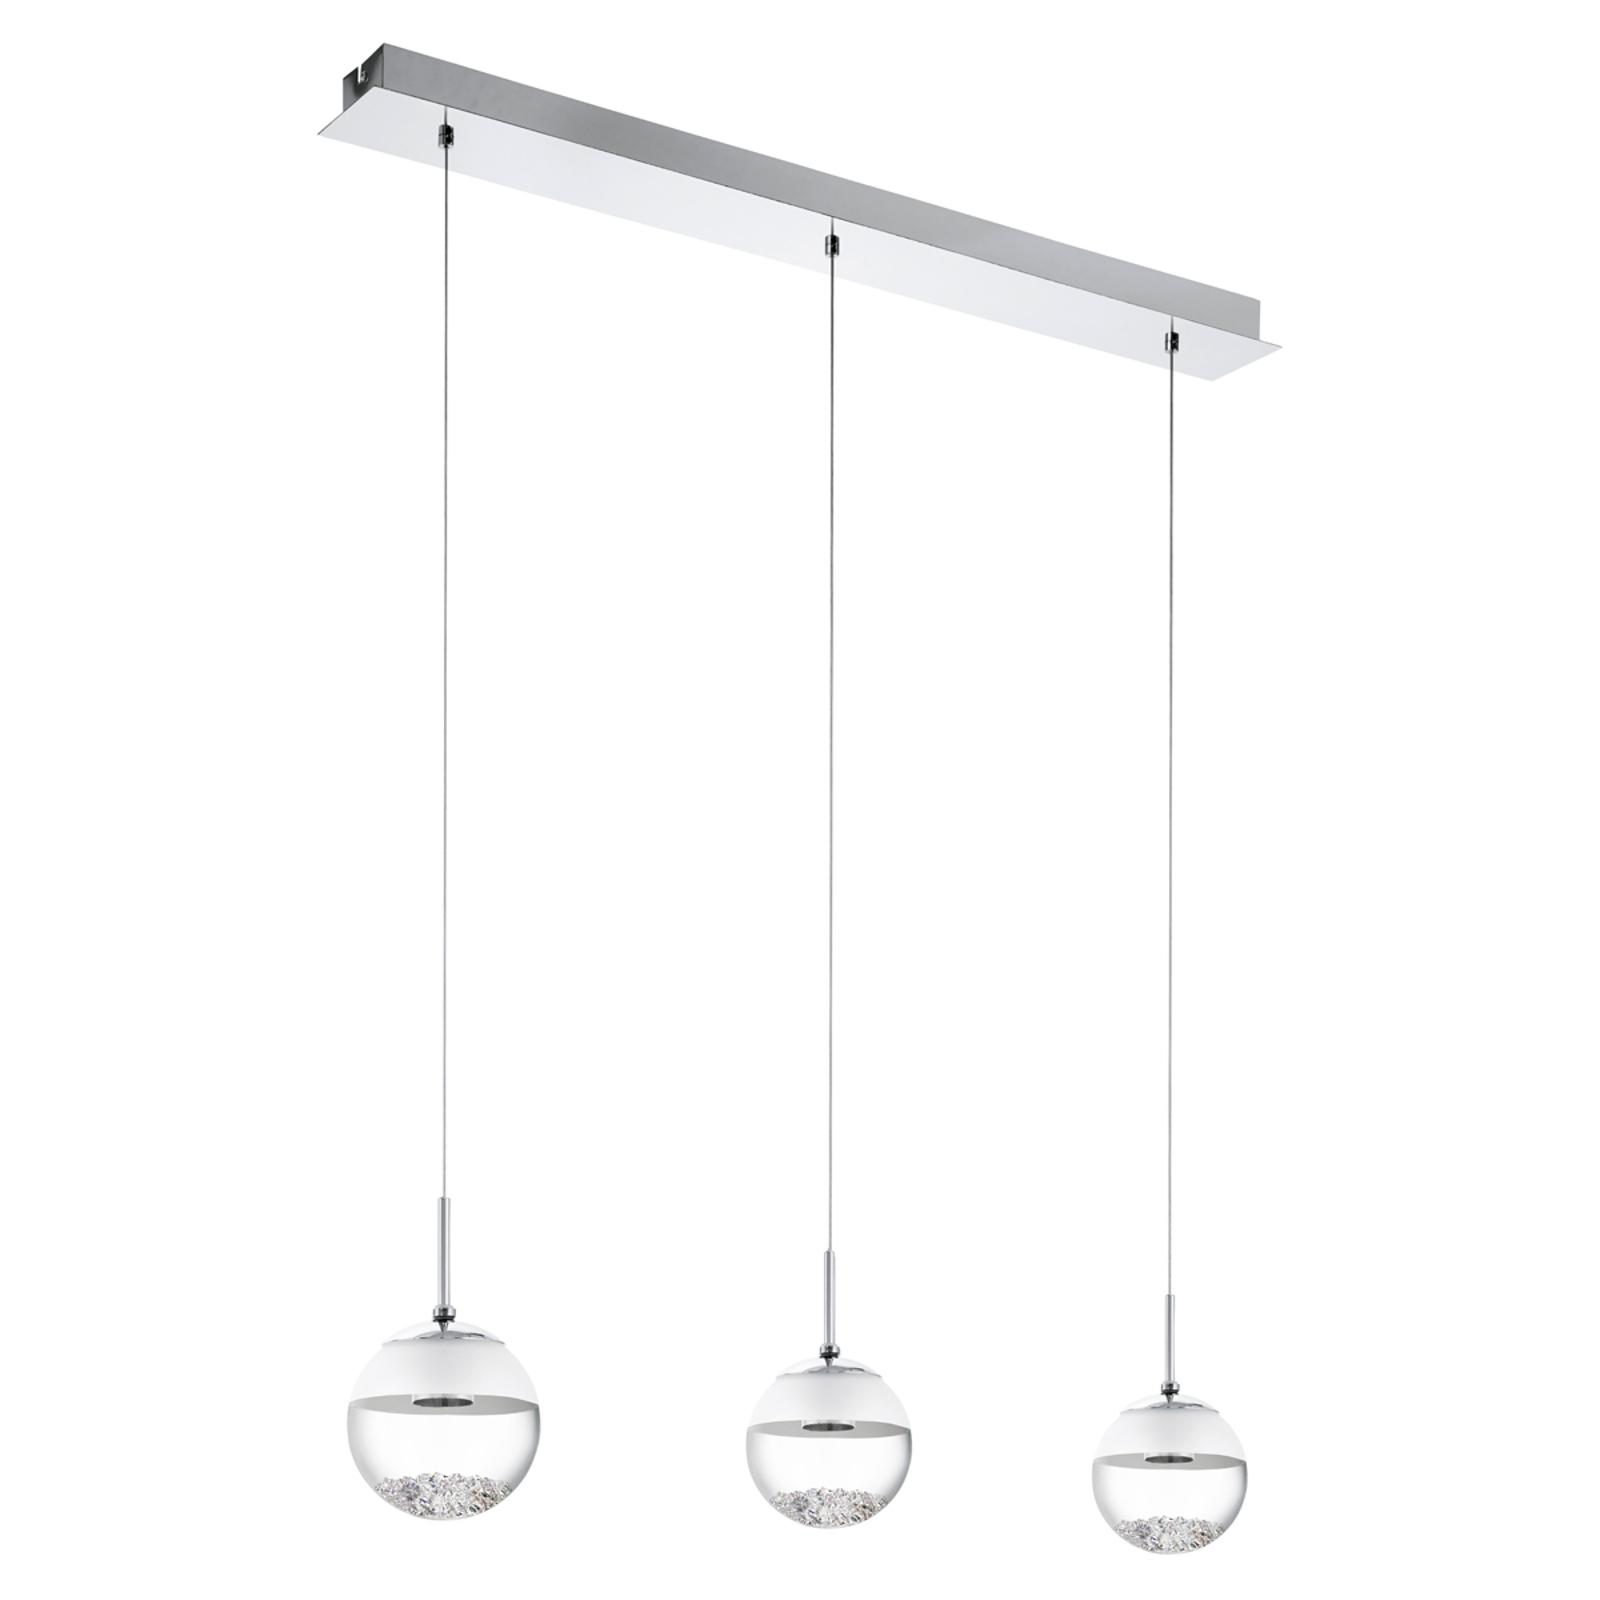 Podlhovasté závesné LED svietidlo Montefio krištáľ